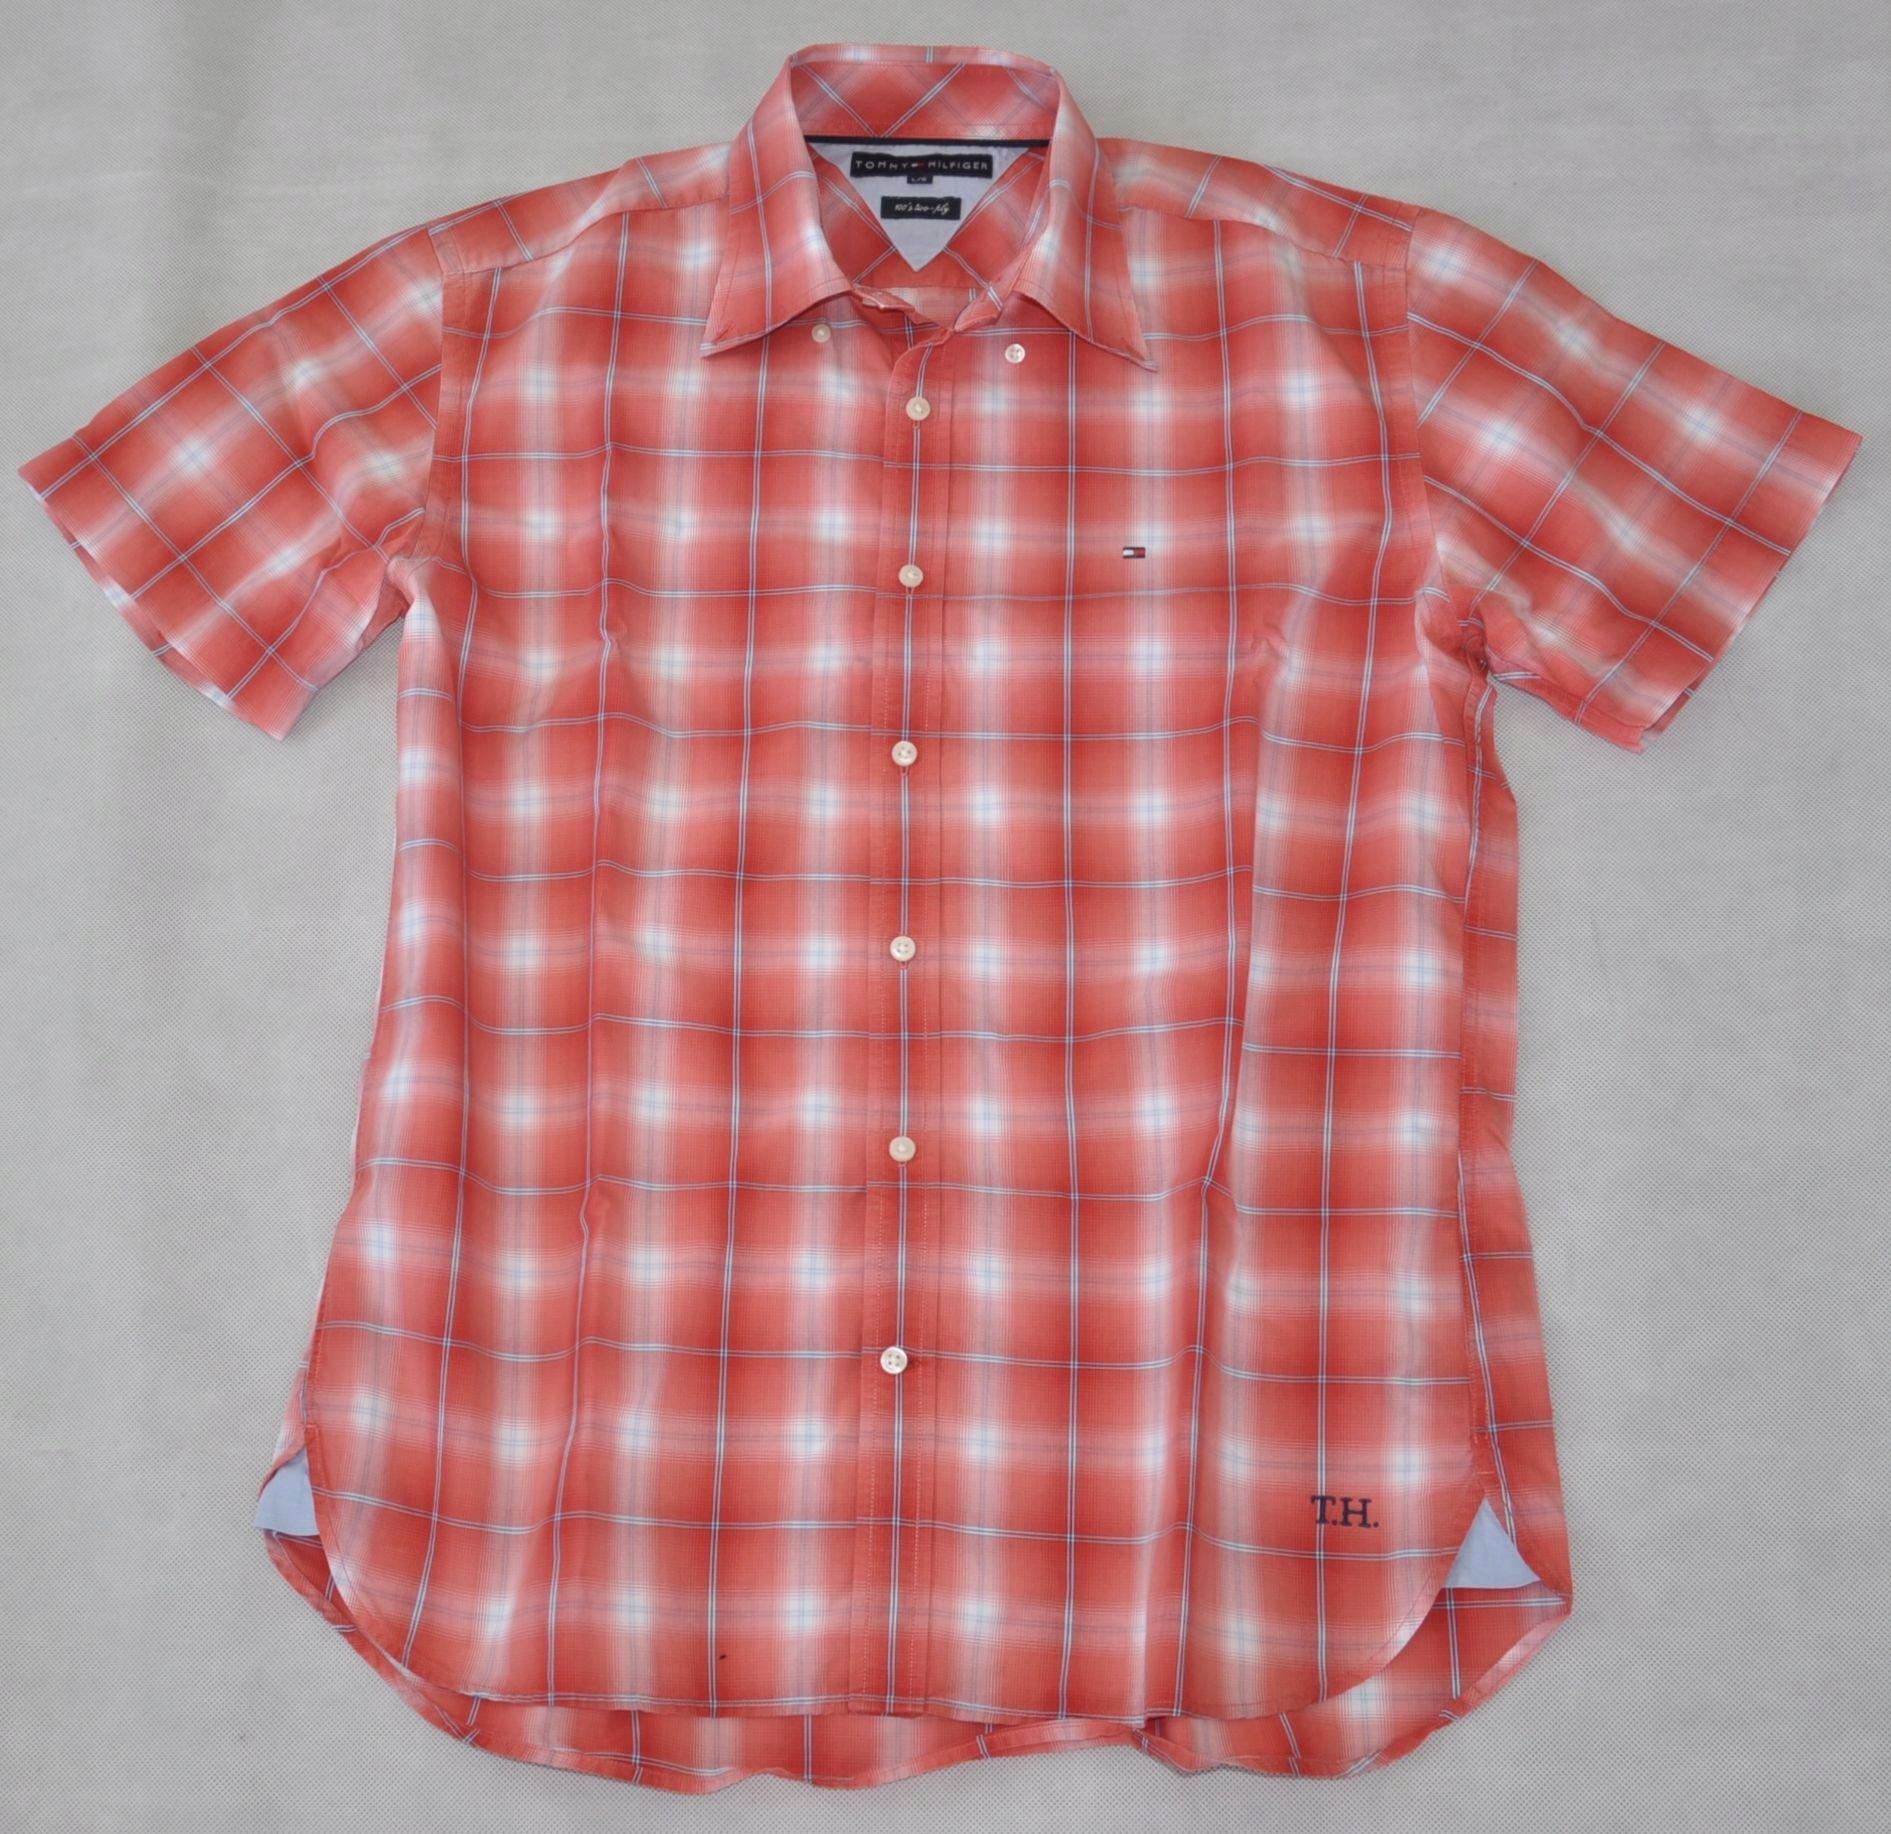 8eca5135d TOMMY HILFIGER modna koszula męska w kratkę L/G 42 - 7525748836 ...